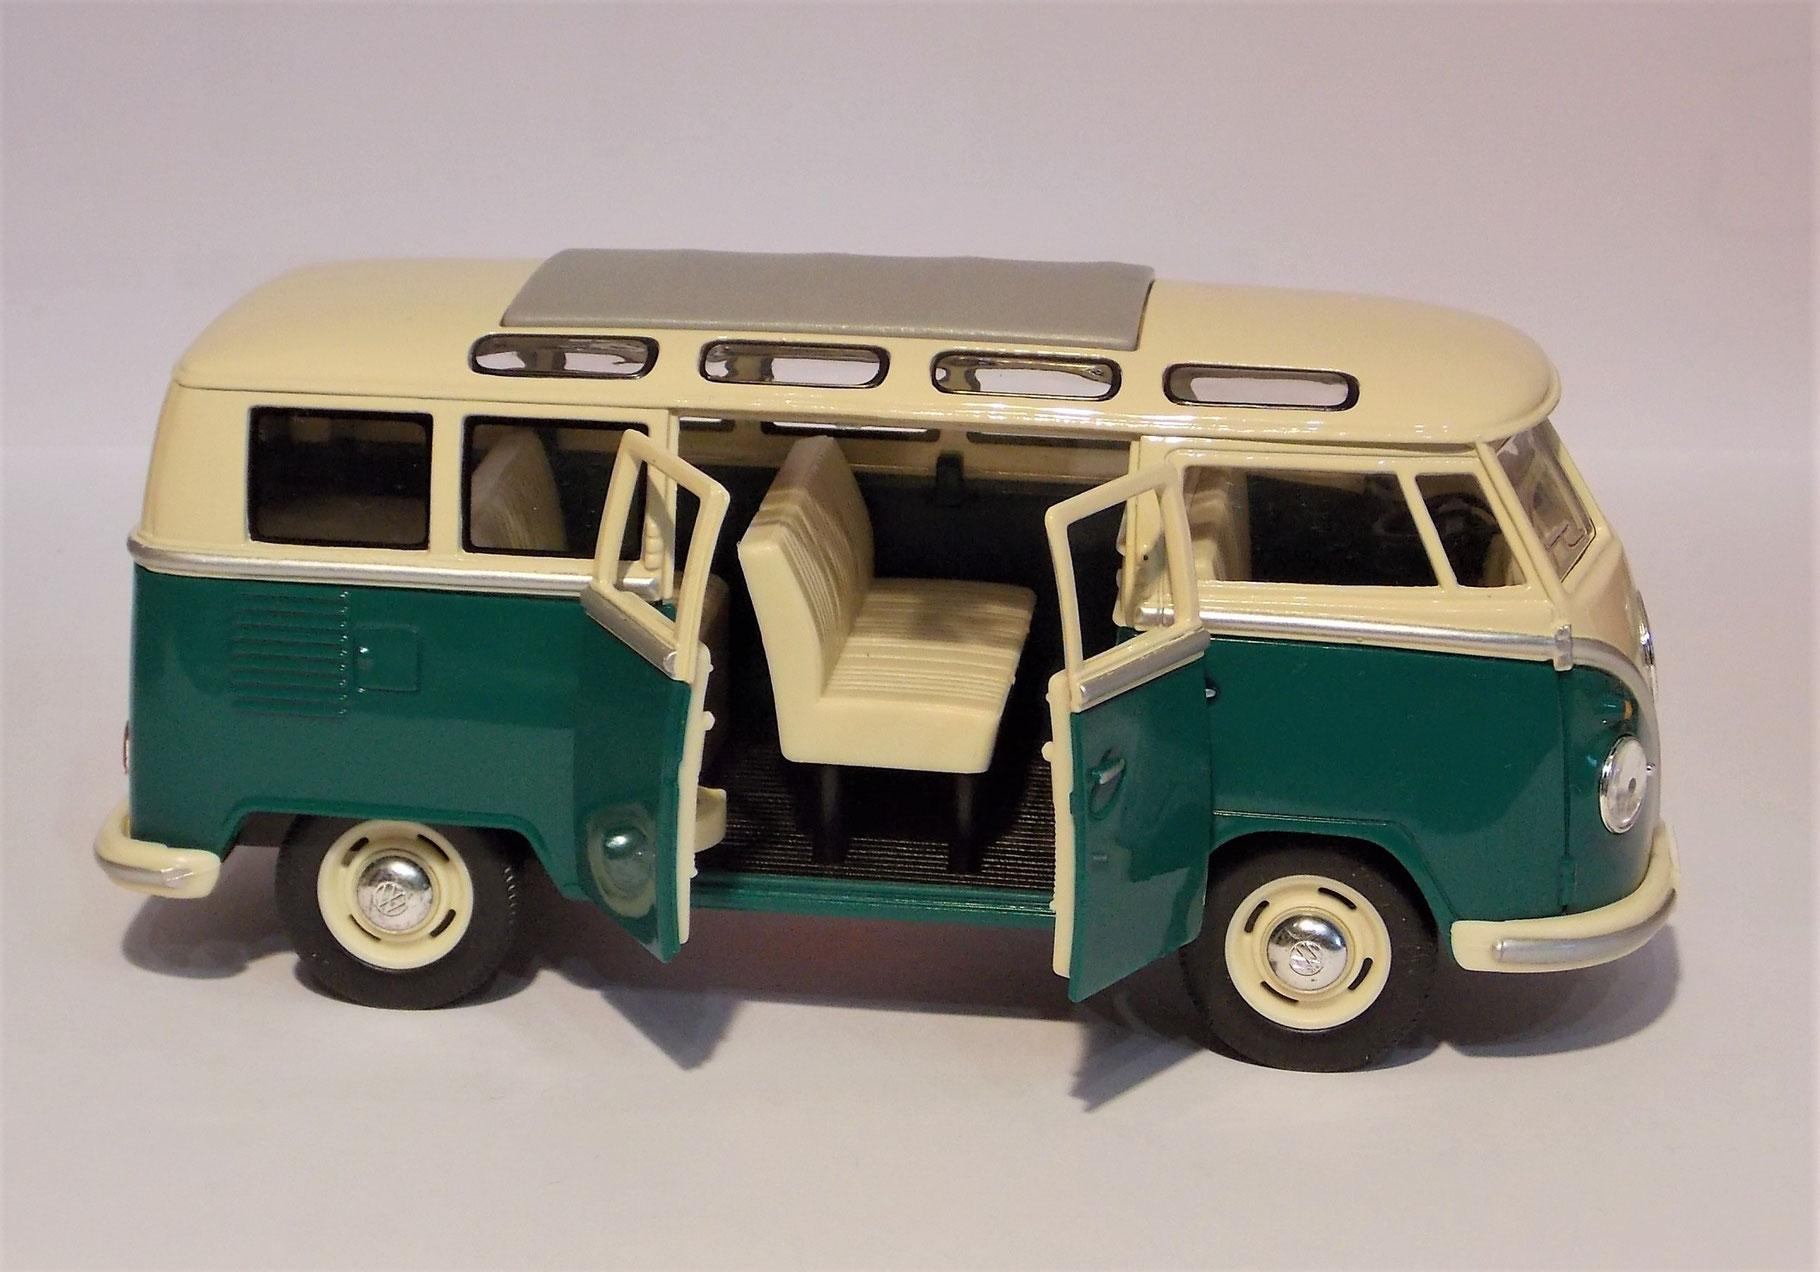 volkswagen bulli t1 t2 pic up lego modellauto 1 43 1. Black Bedroom Furniture Sets. Home Design Ideas